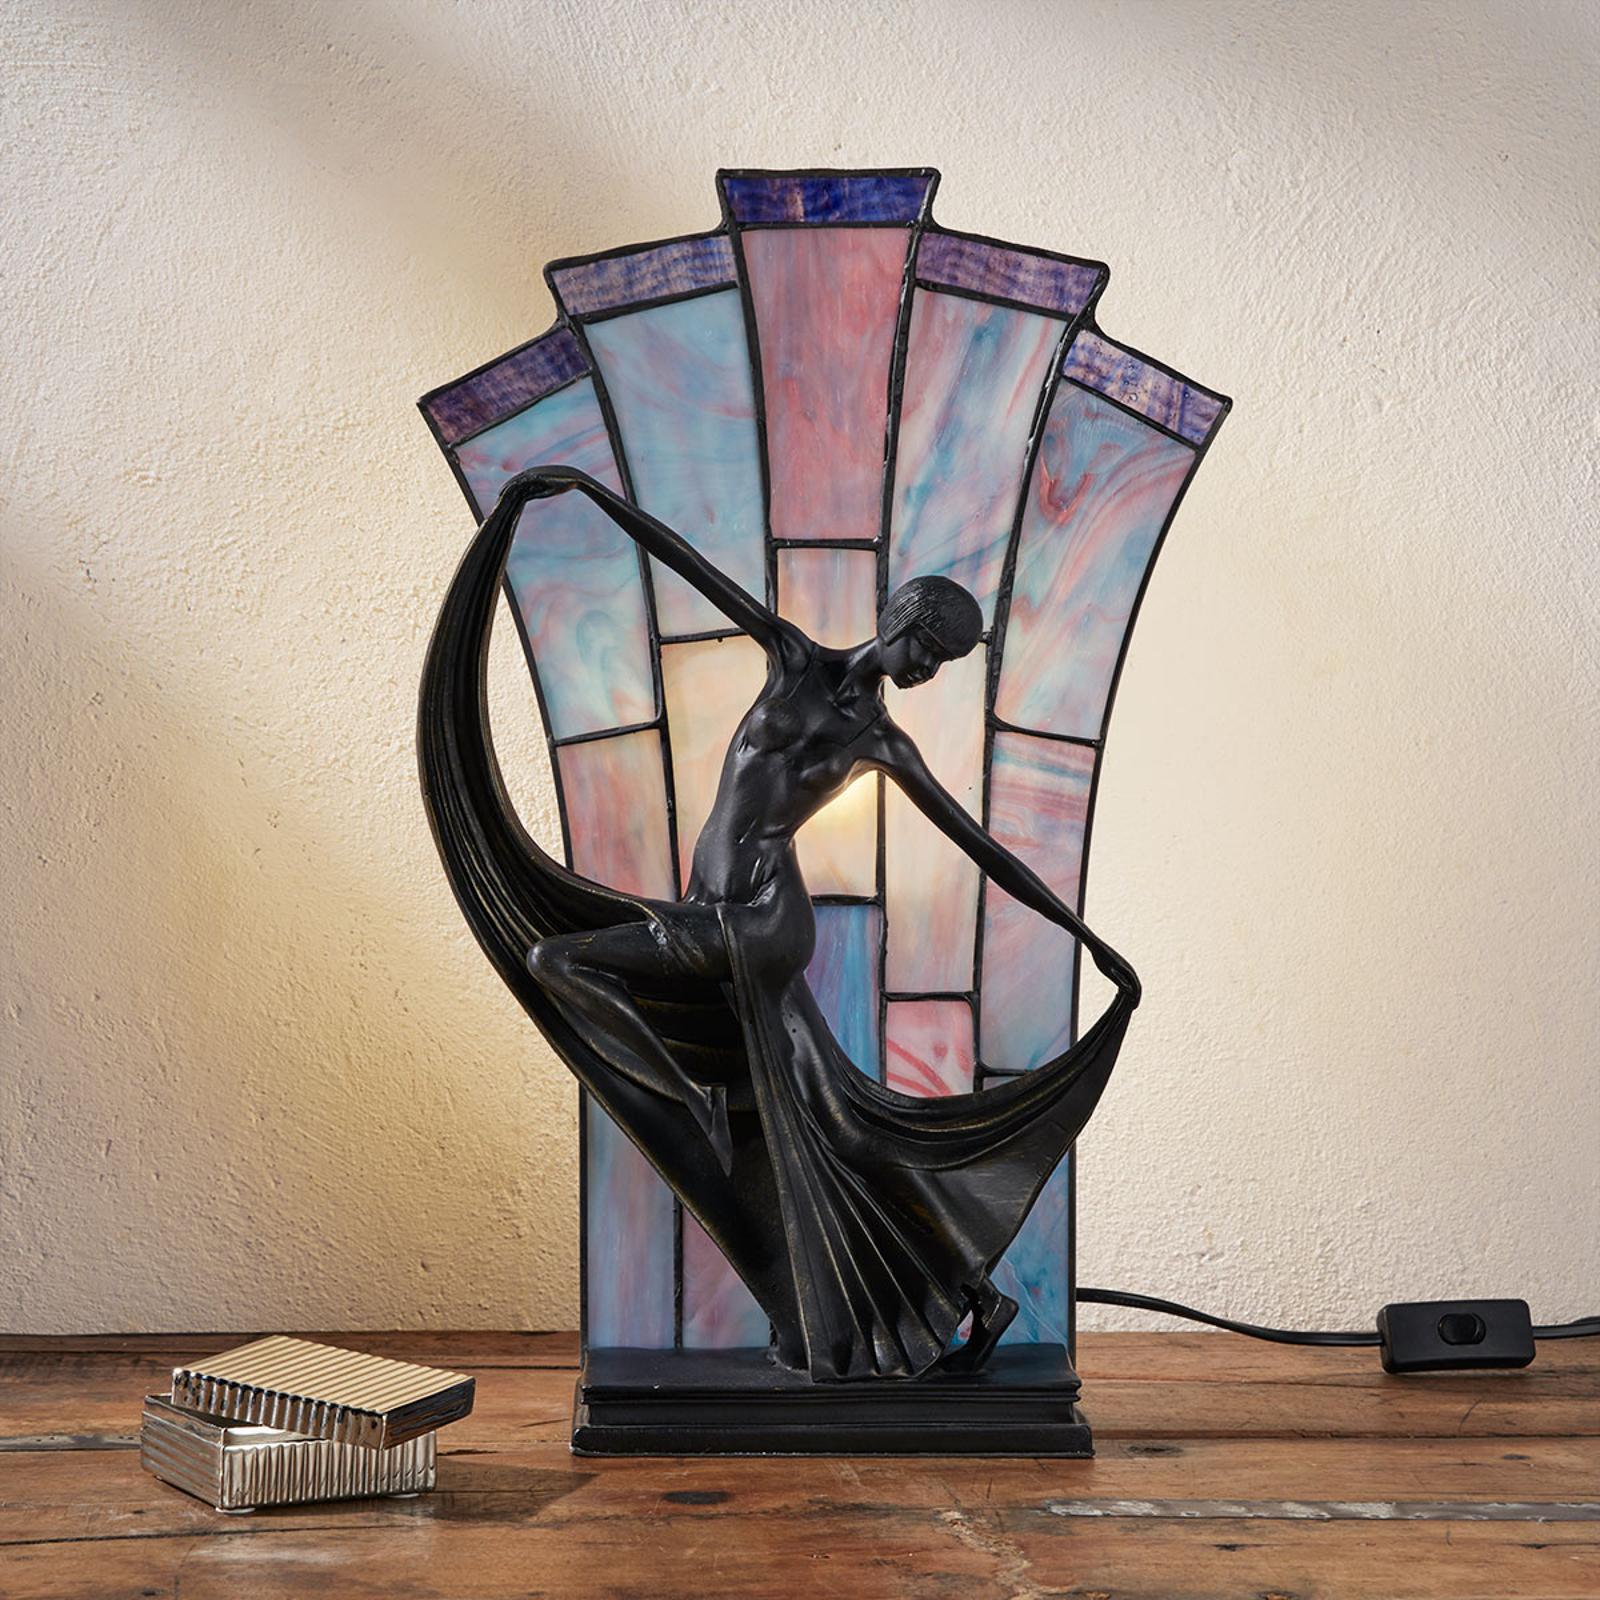 Tiltalende Flamina bordlampe i Tiffany-stil